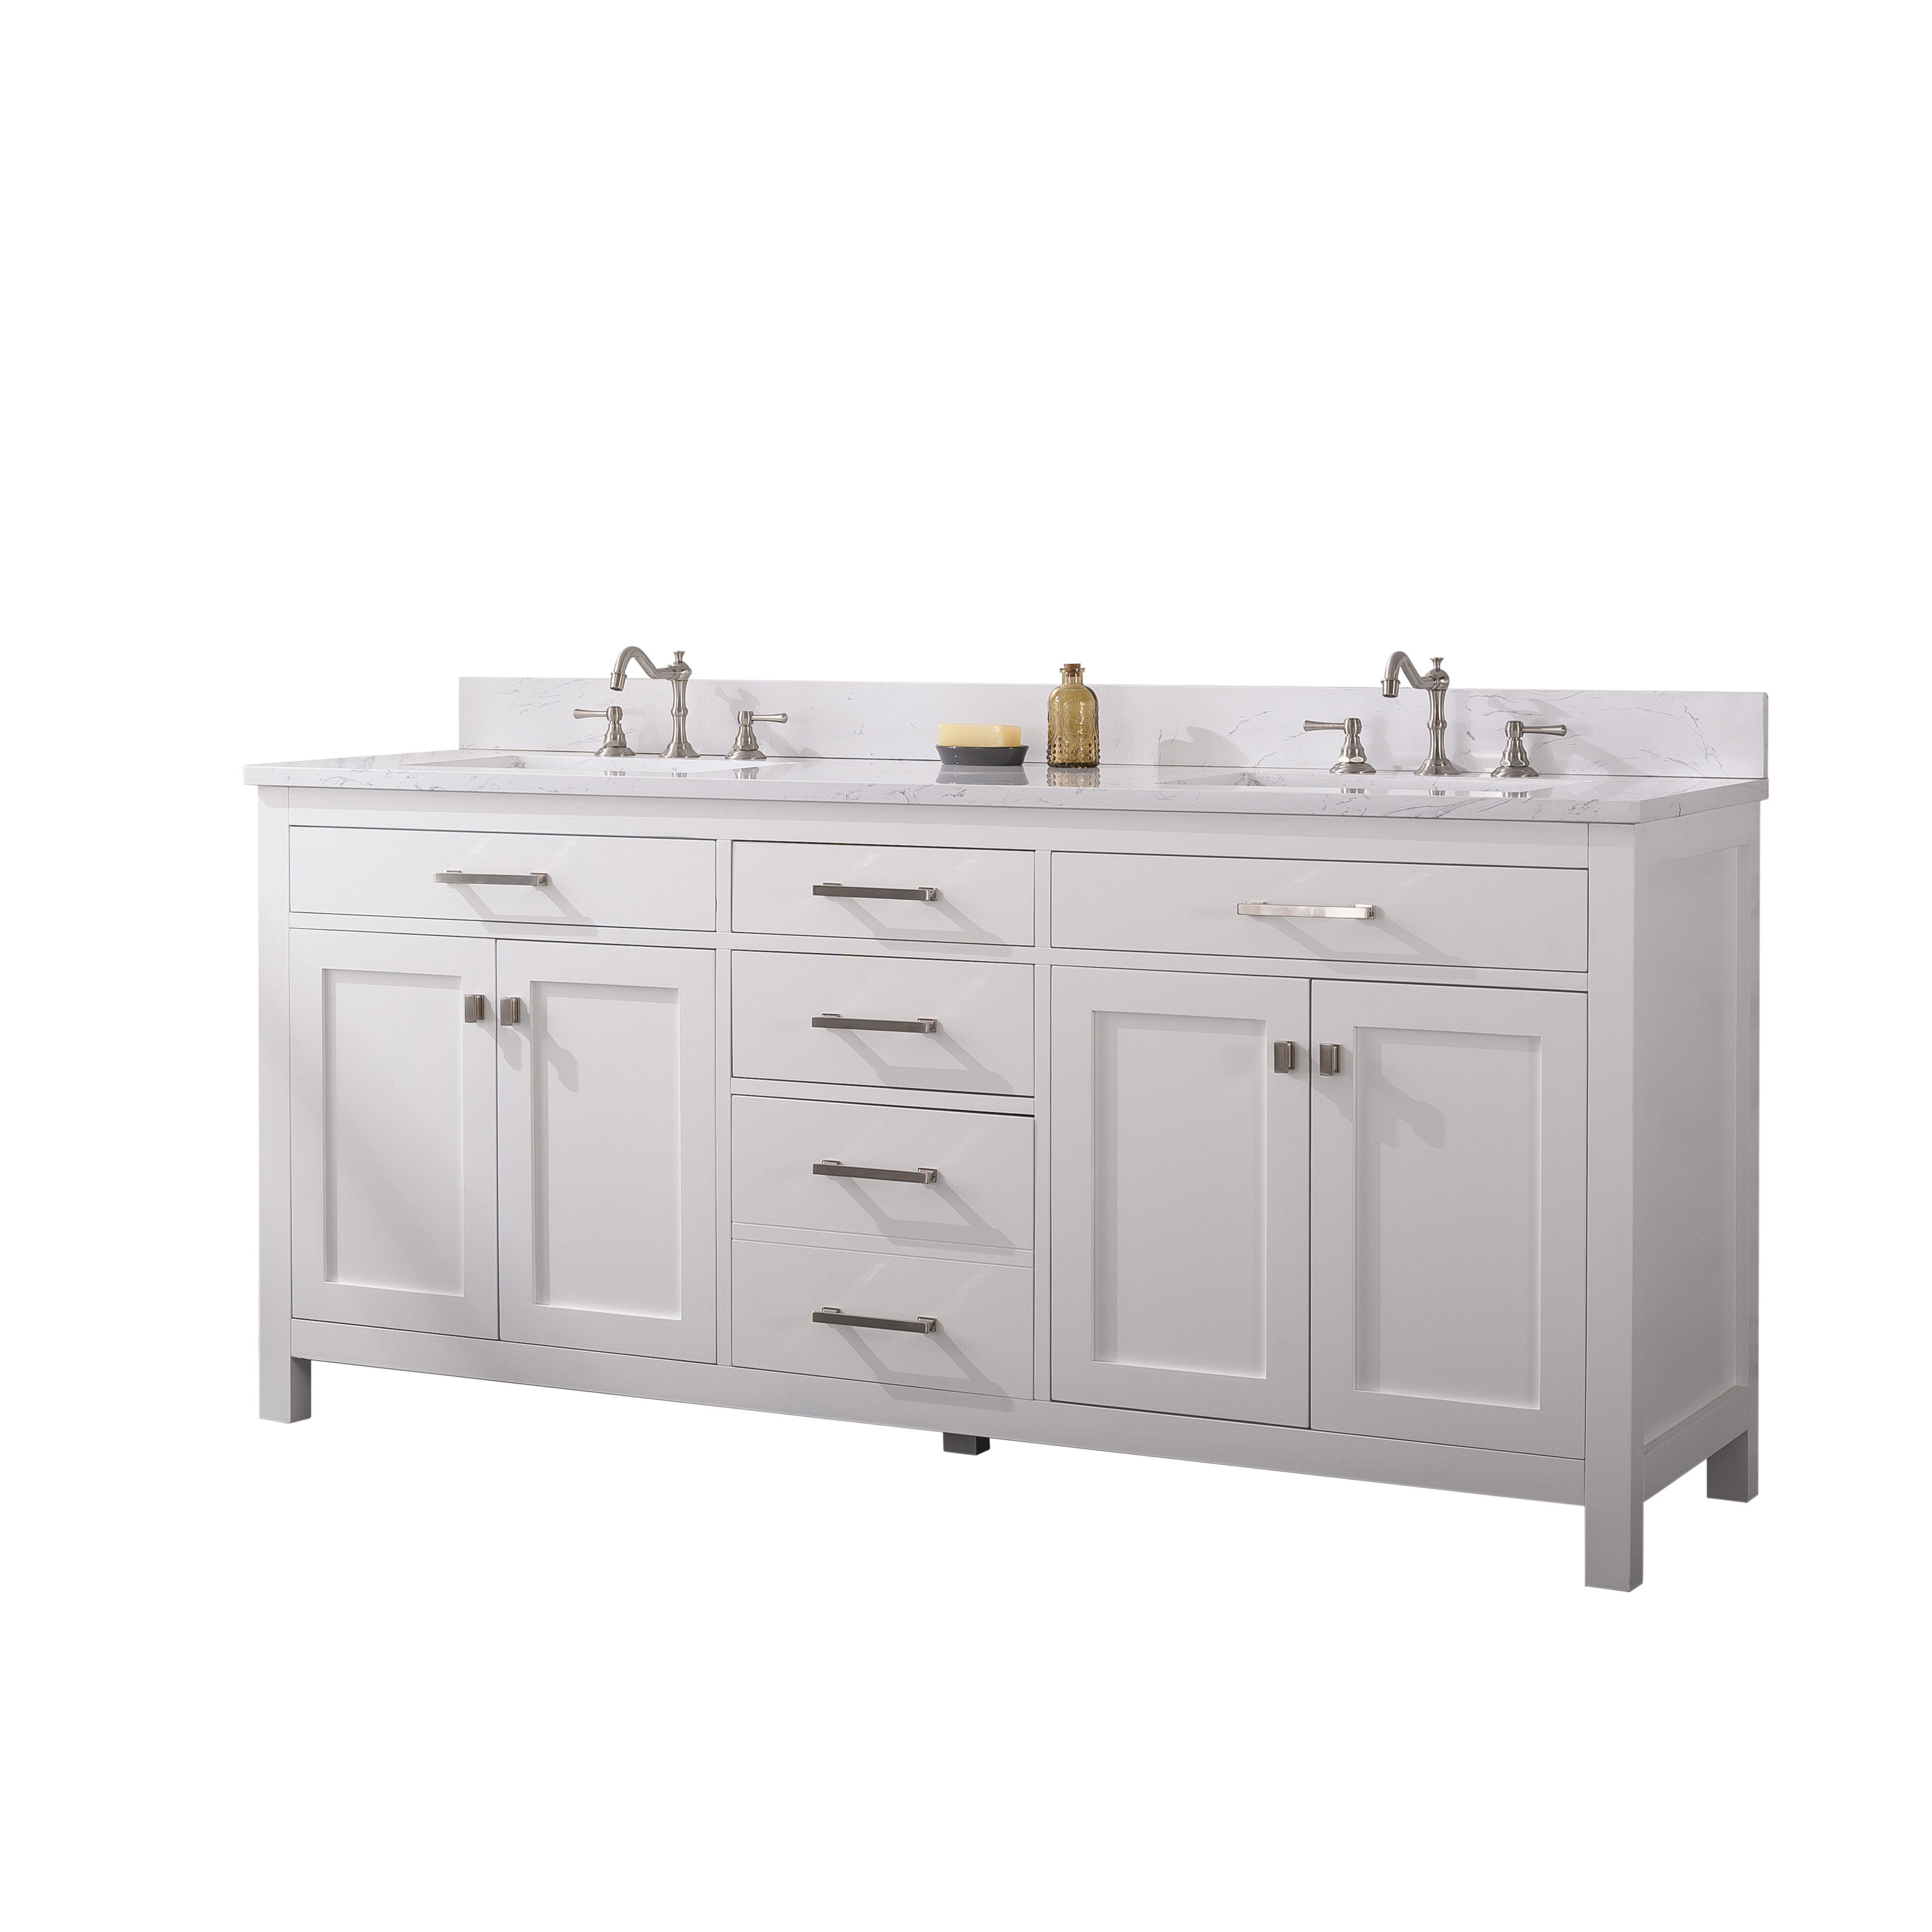 Atencio 72 Double Bathroom Vanity Set Reviews Joss Main